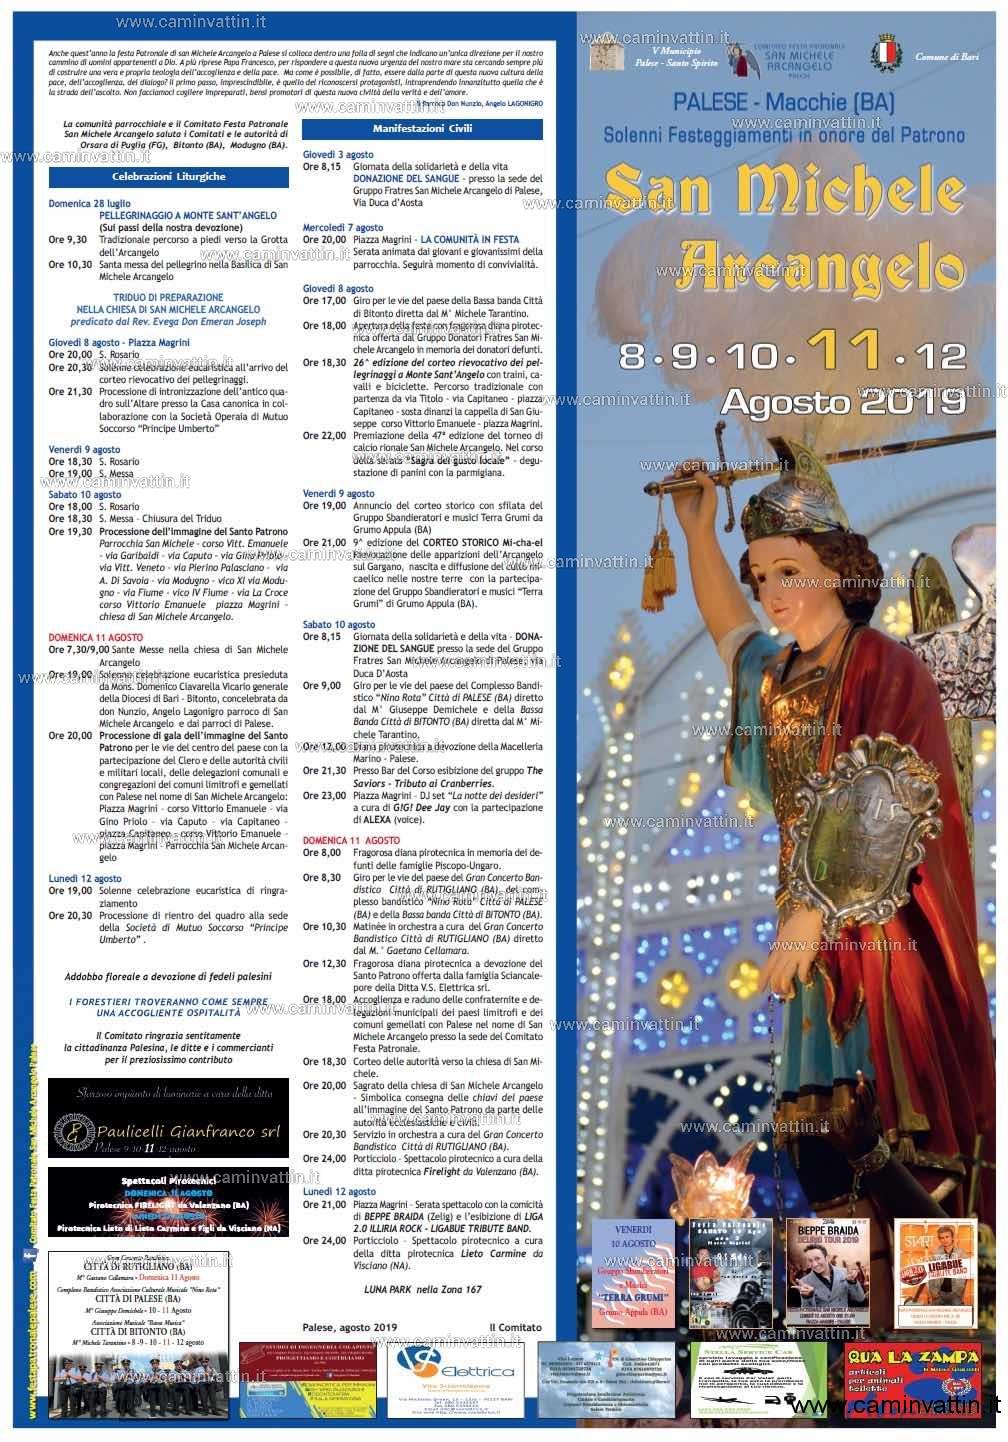 San Michele Data Calendario.Festa Patronale Di San Michele Arcangelo A Palese Il